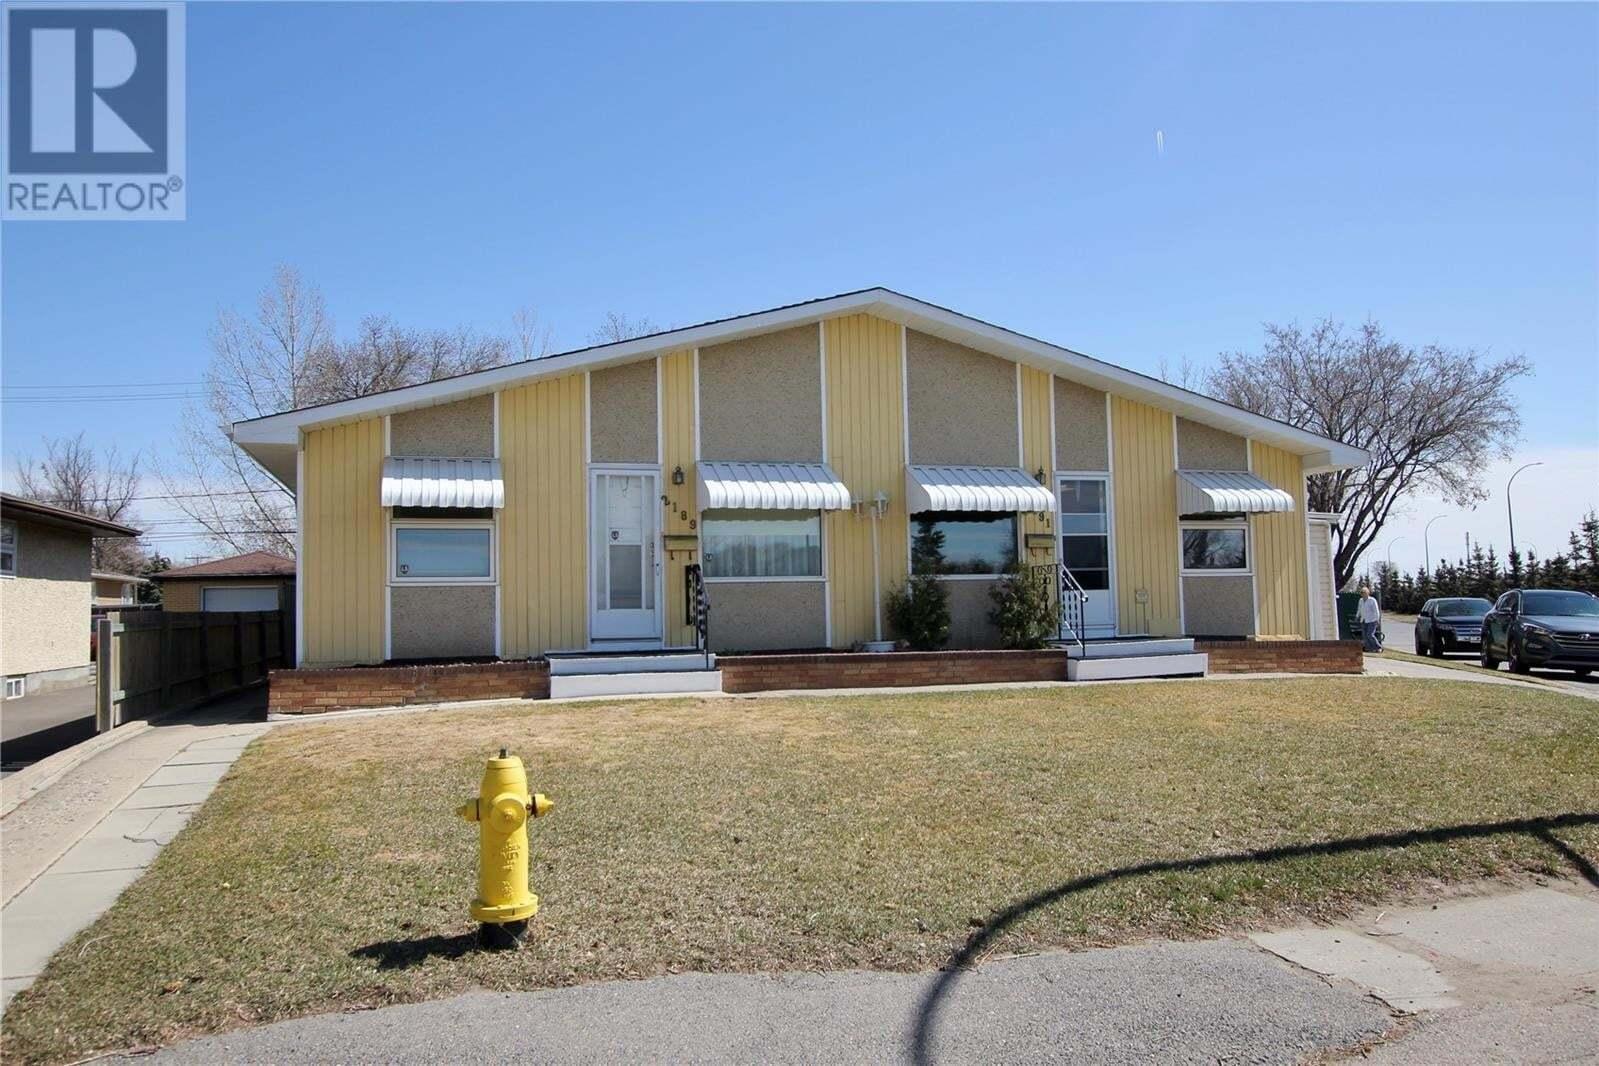 Townhouse for sale at 2189/2191 Embury St Regina Saskatchewan - MLS: SK827625